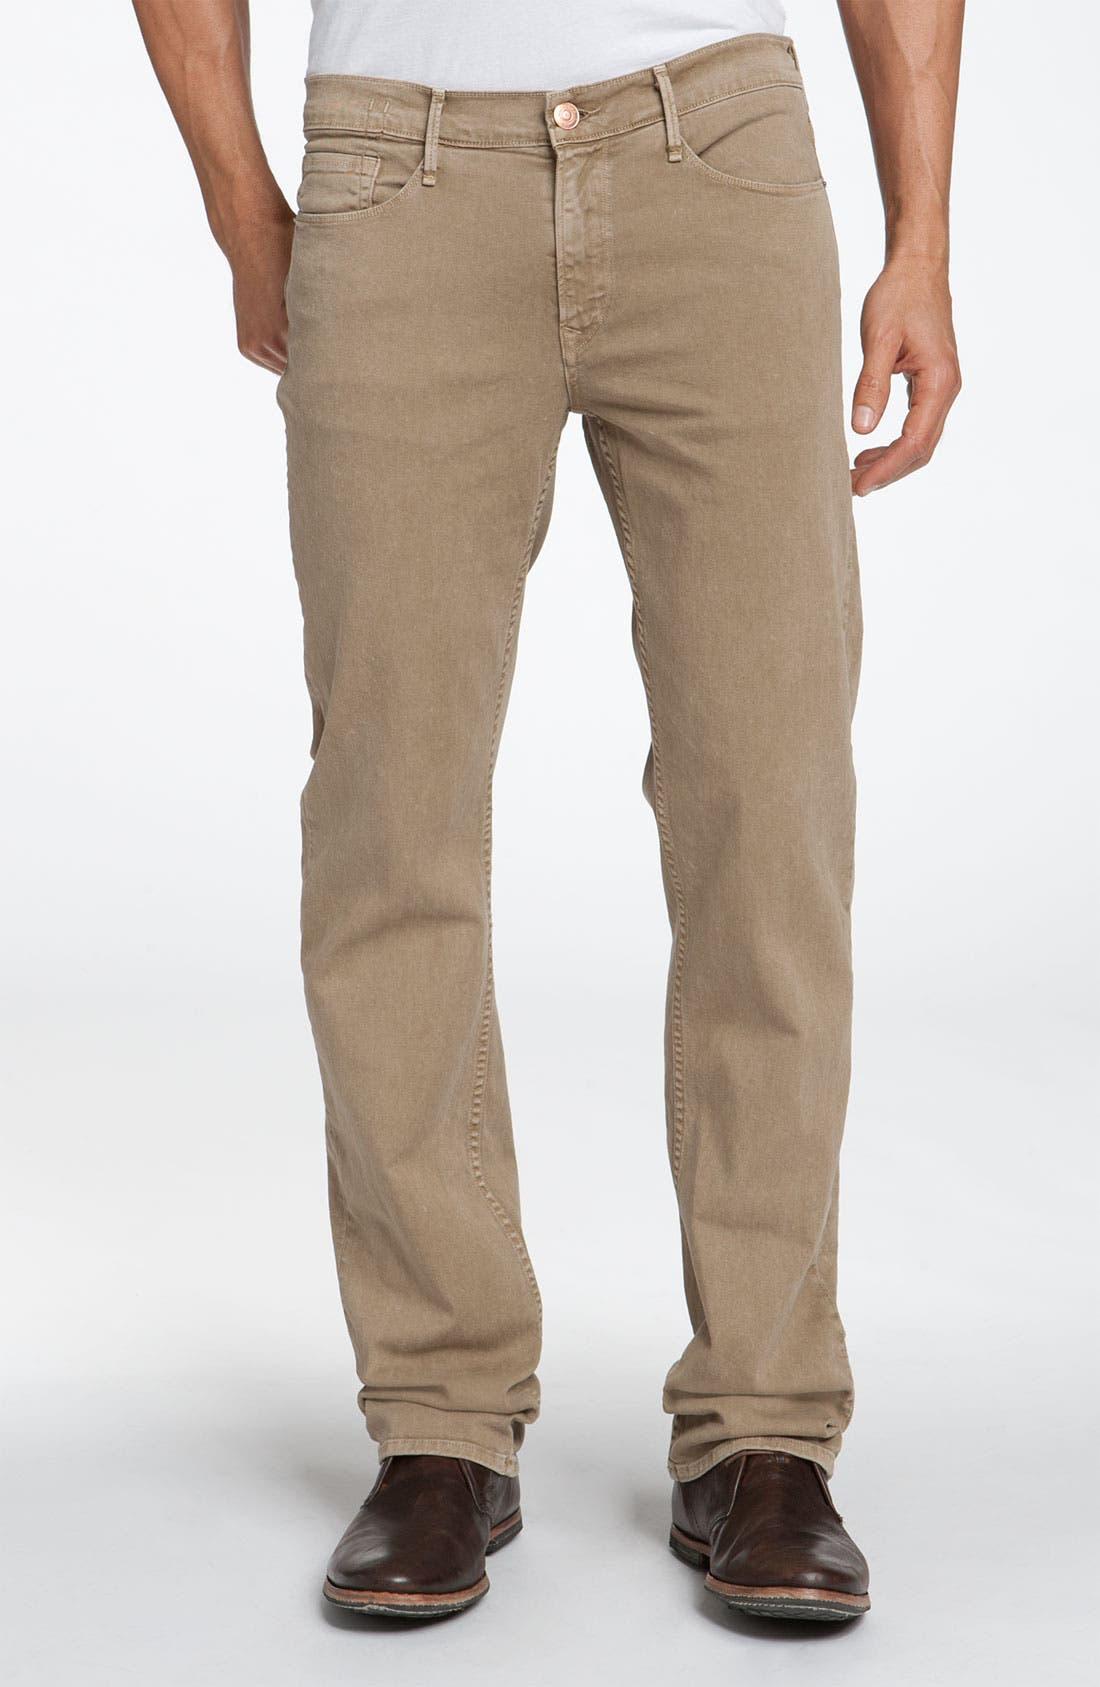 Main Image - Earnest Sewn 'Fulton' Straight Leg Twill Pants